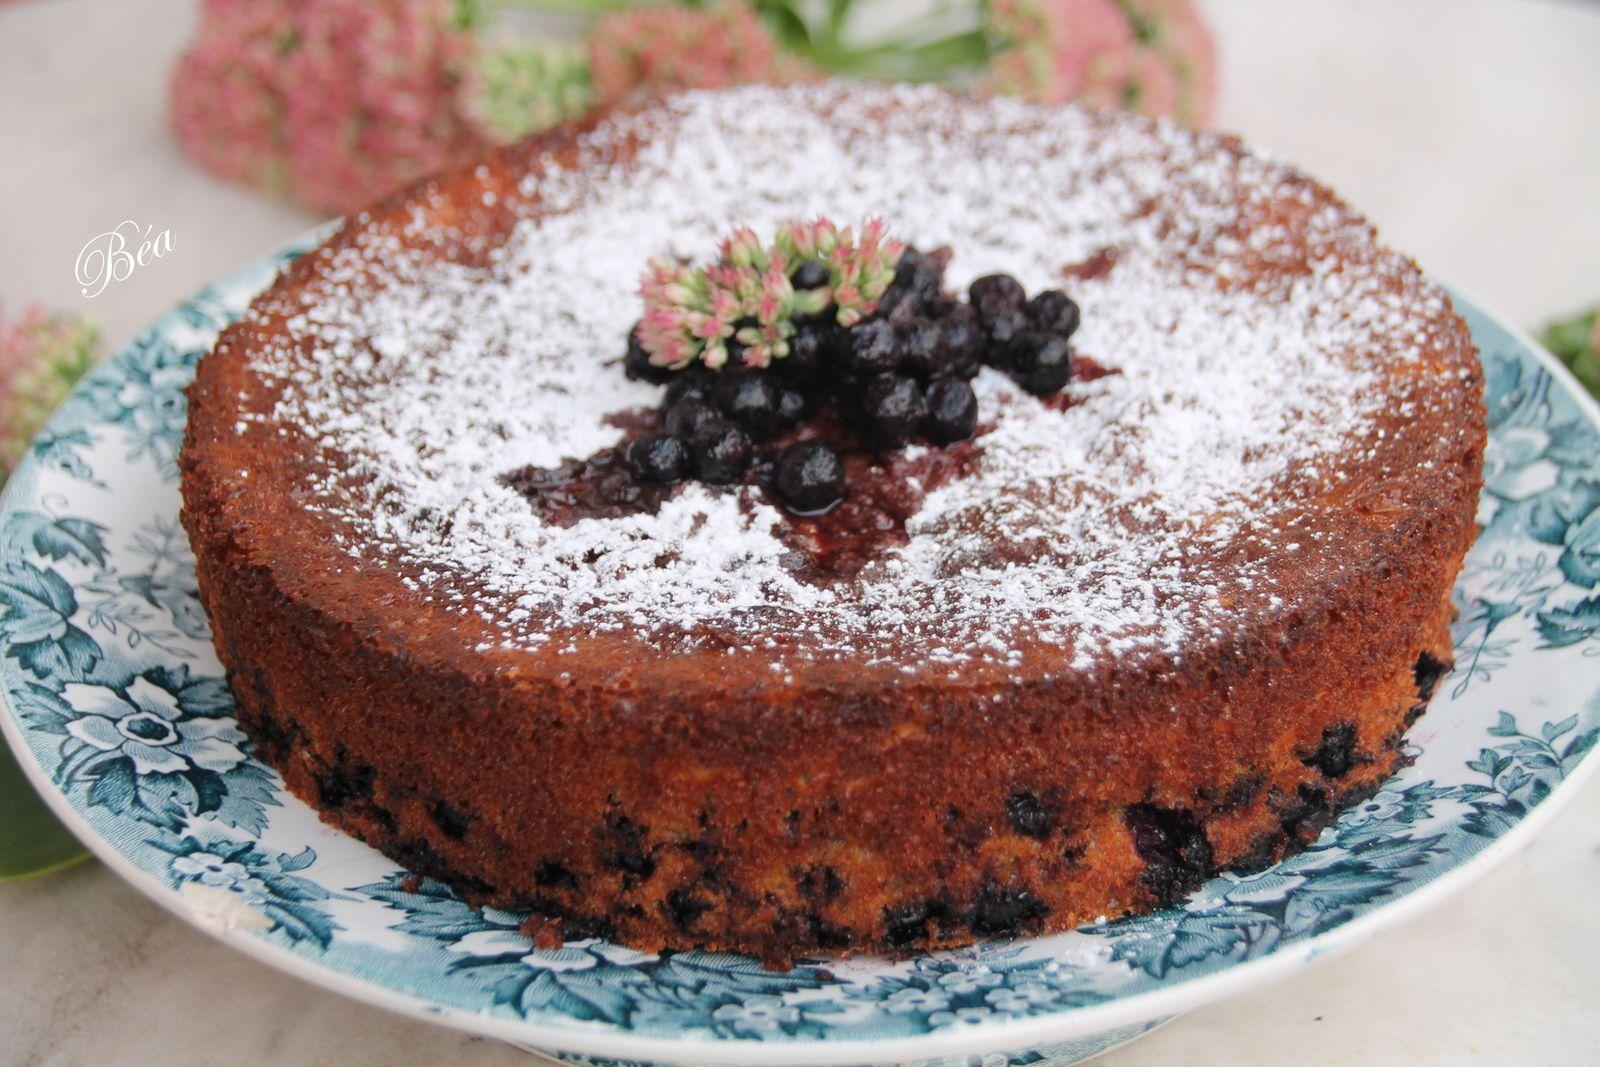 Gâteau vosgien aux myrtilles - balade vosgienne